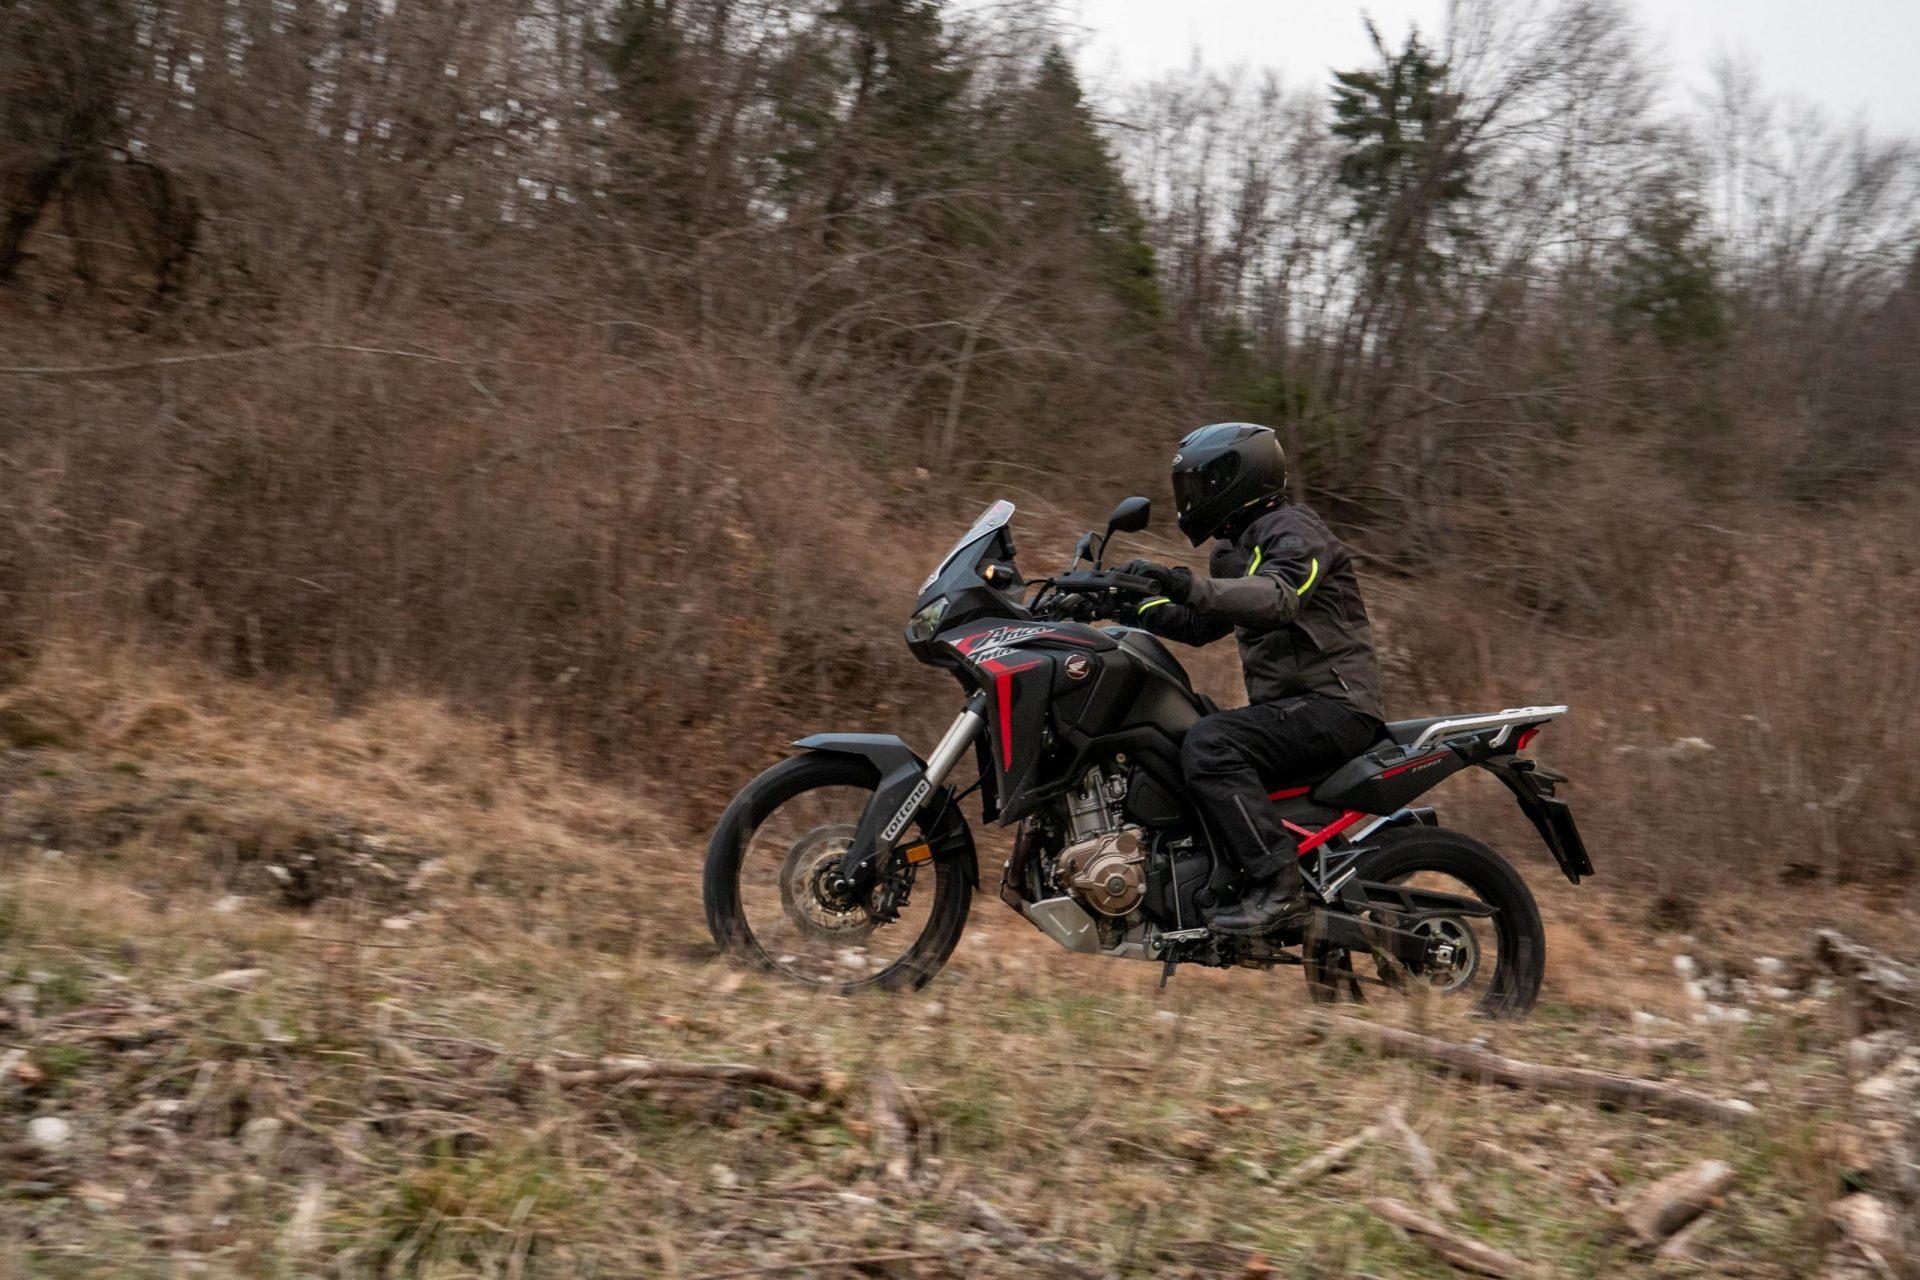 P1088510-1-scaled Advanced Riderwear